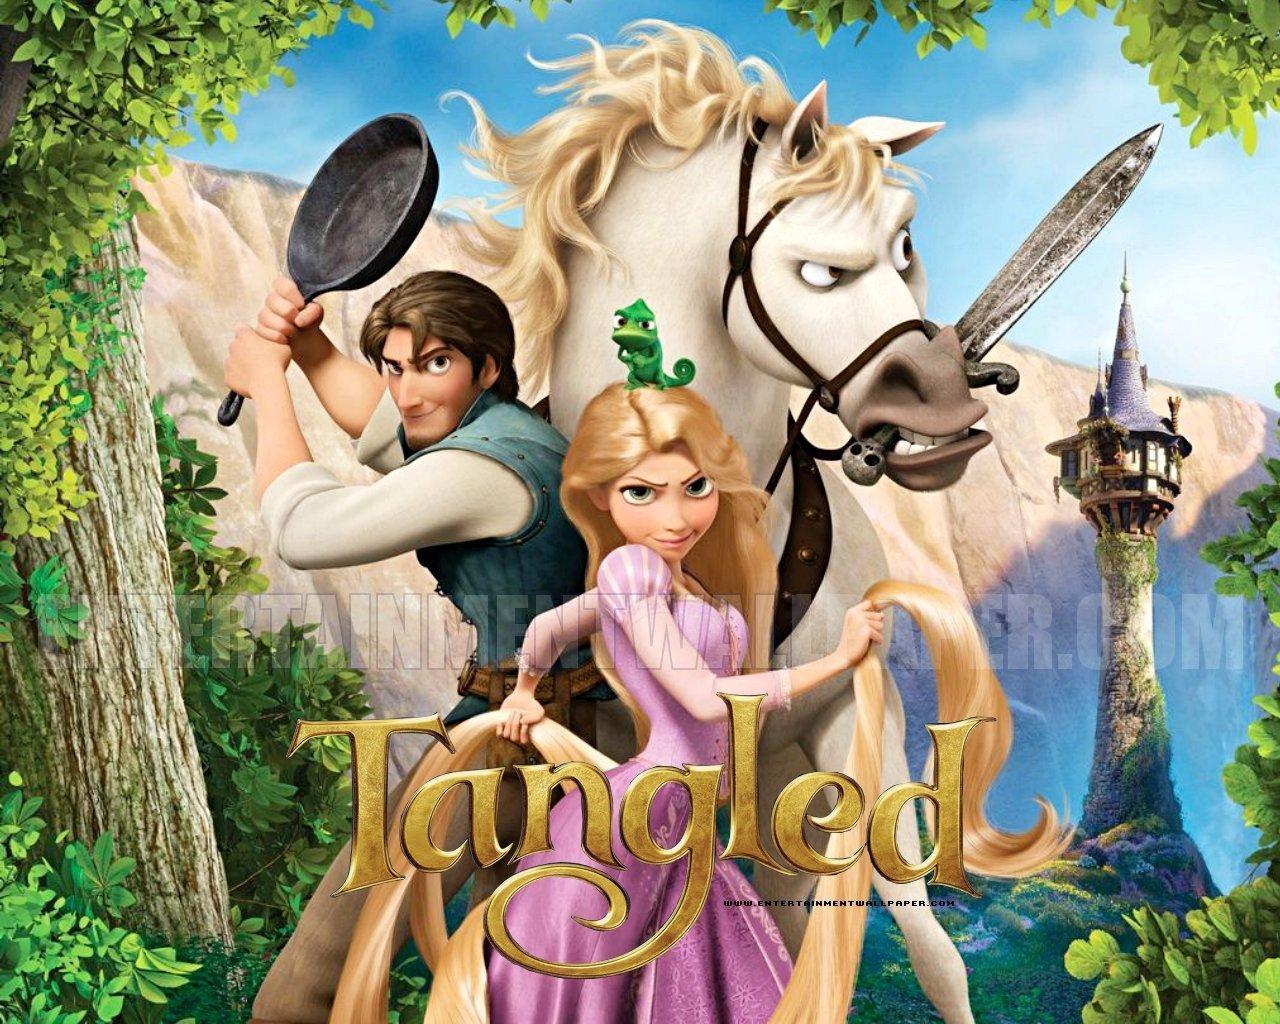 Tangled Disney Wallpaper   Princess Rapunzel from Tangled 1280x1024